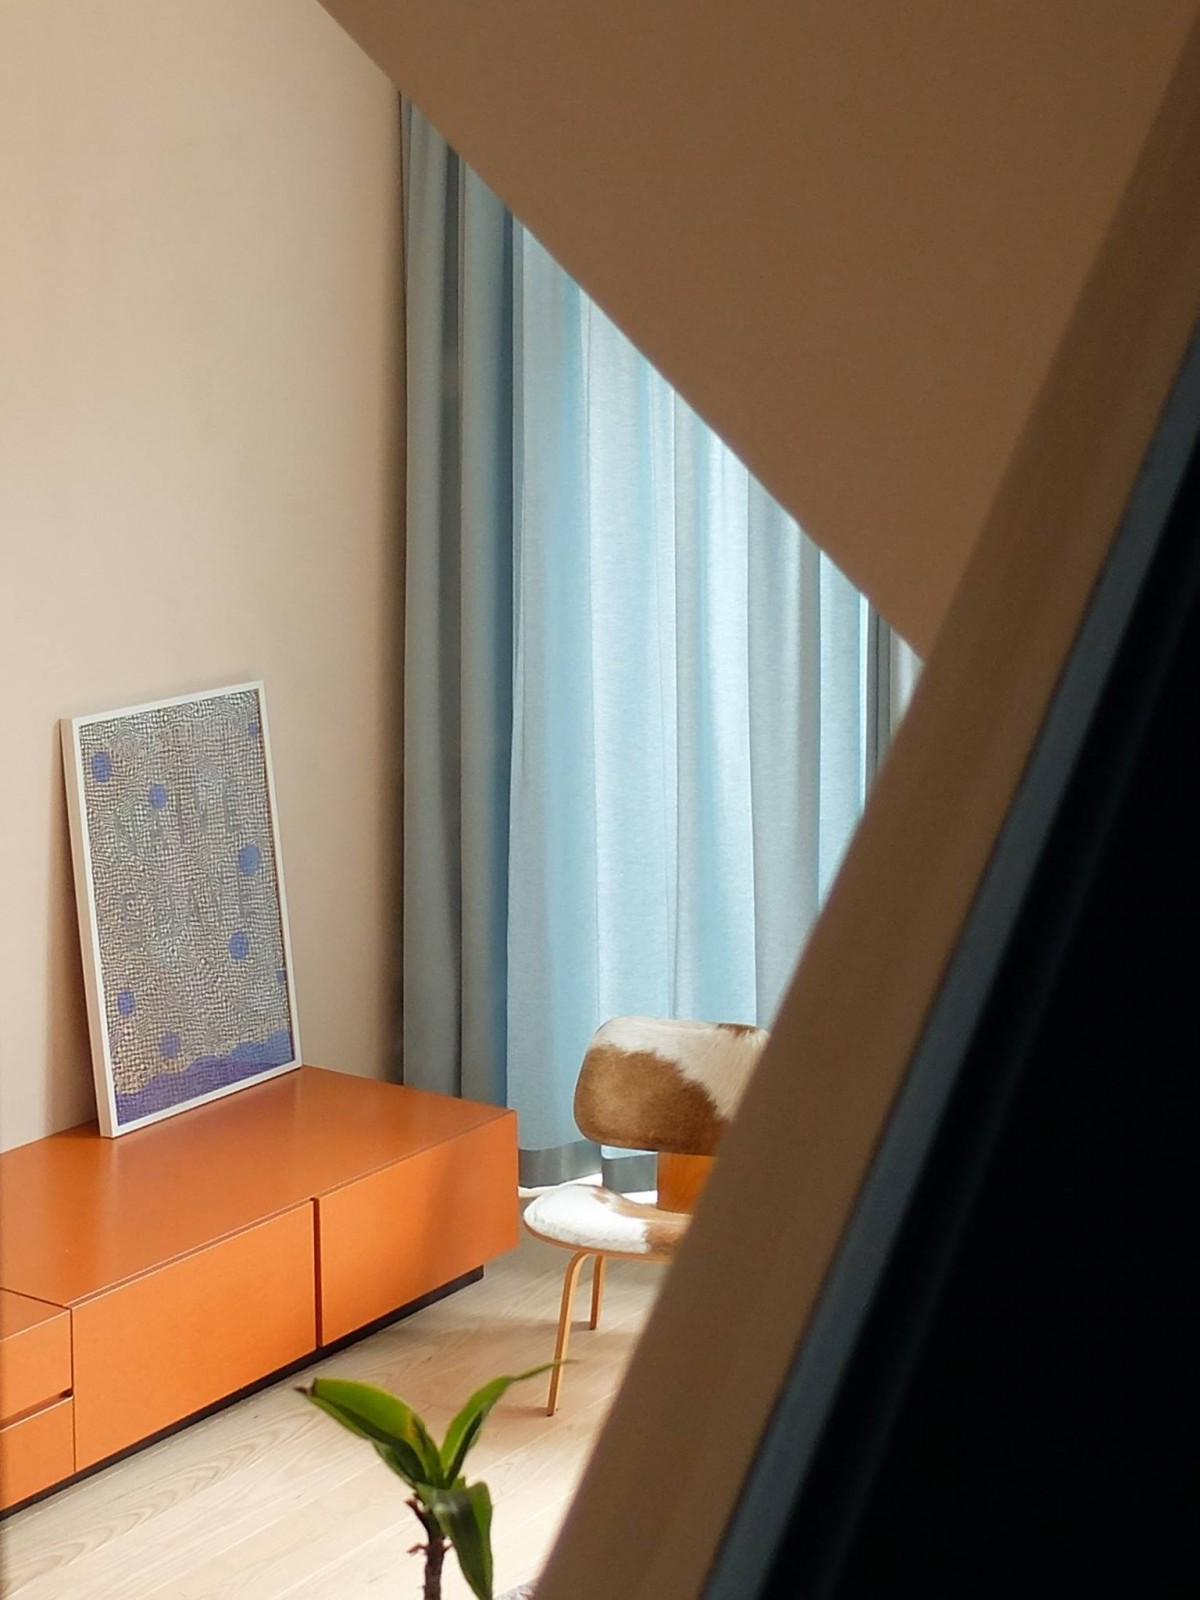 Come have a peak in our Workhome-Playhome for Gluren bij de Buren open house.